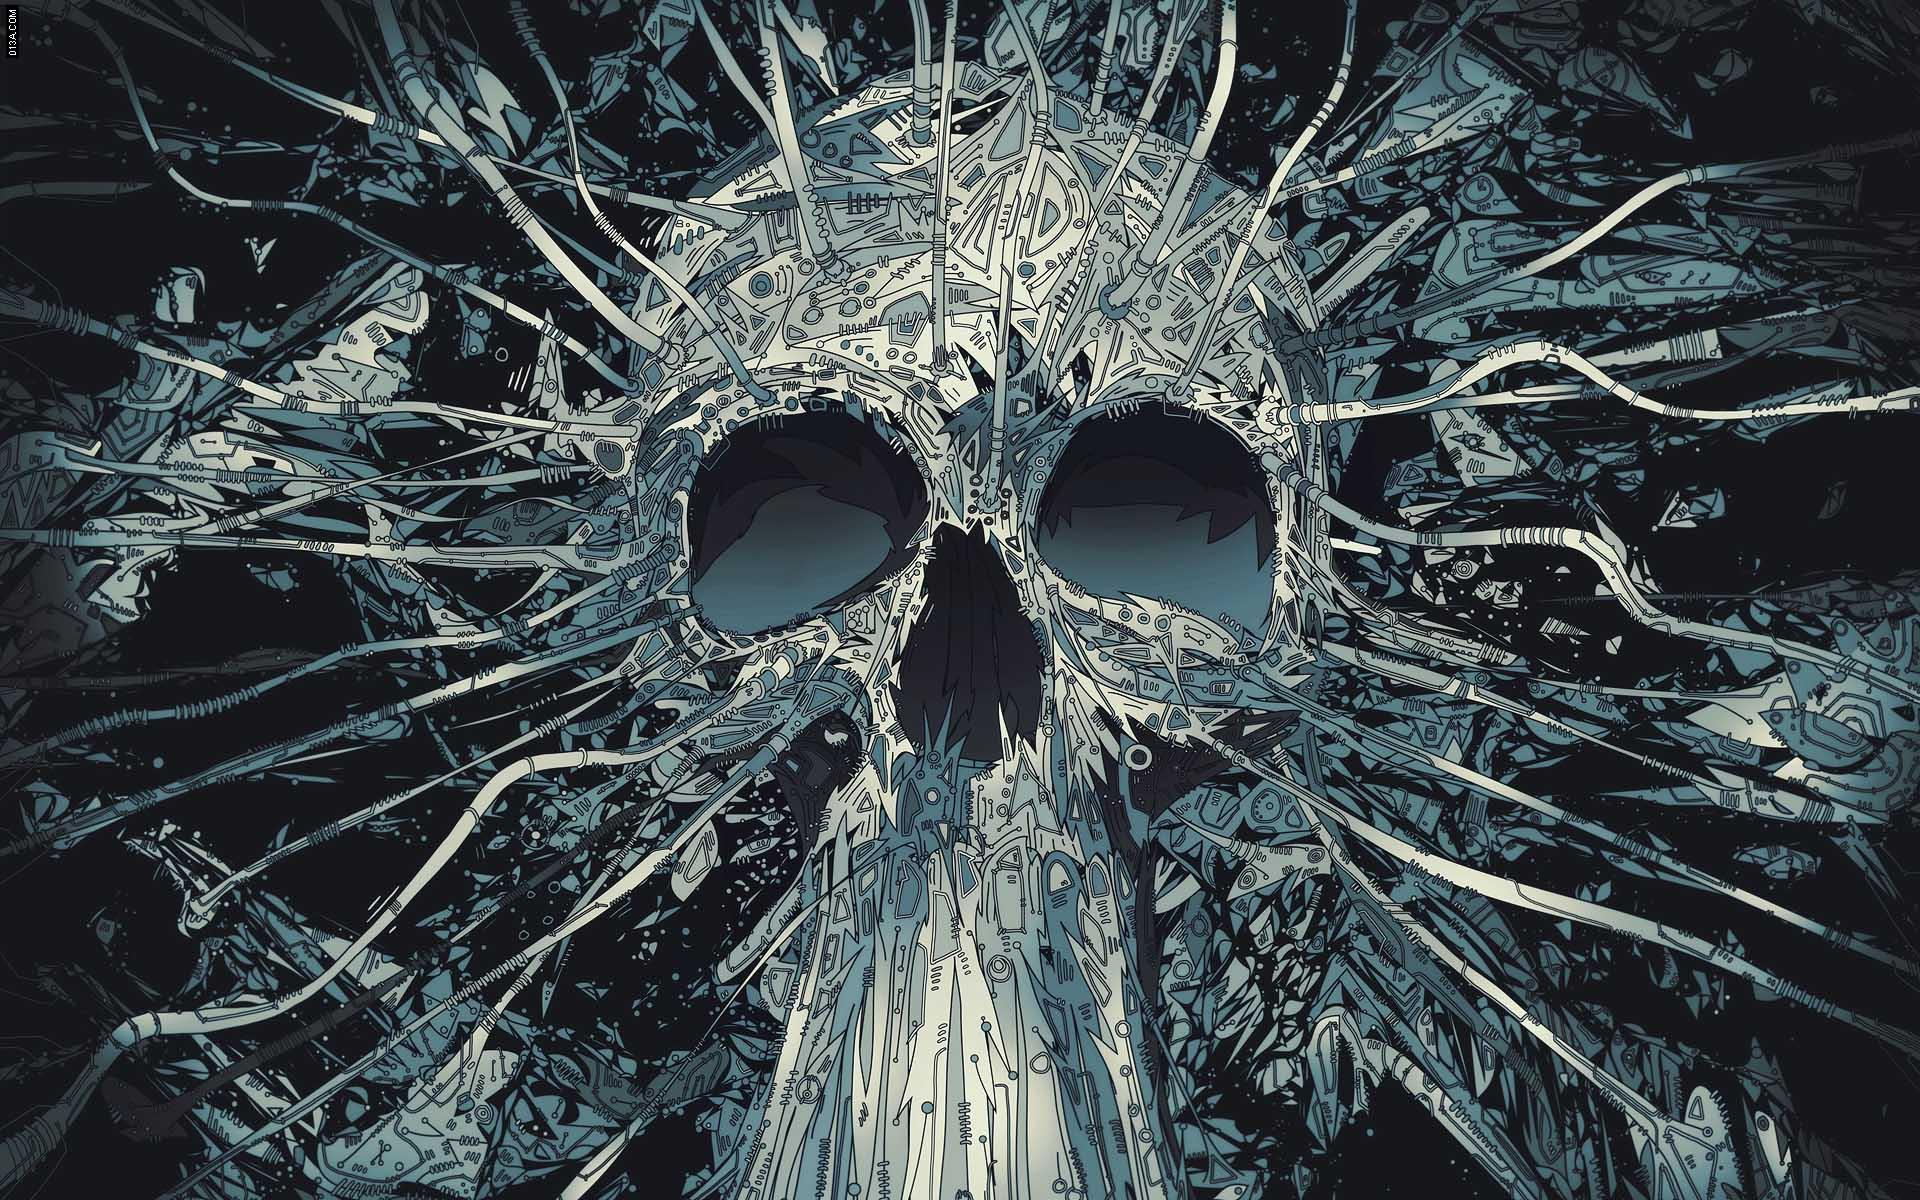 skull artwork wallpapers